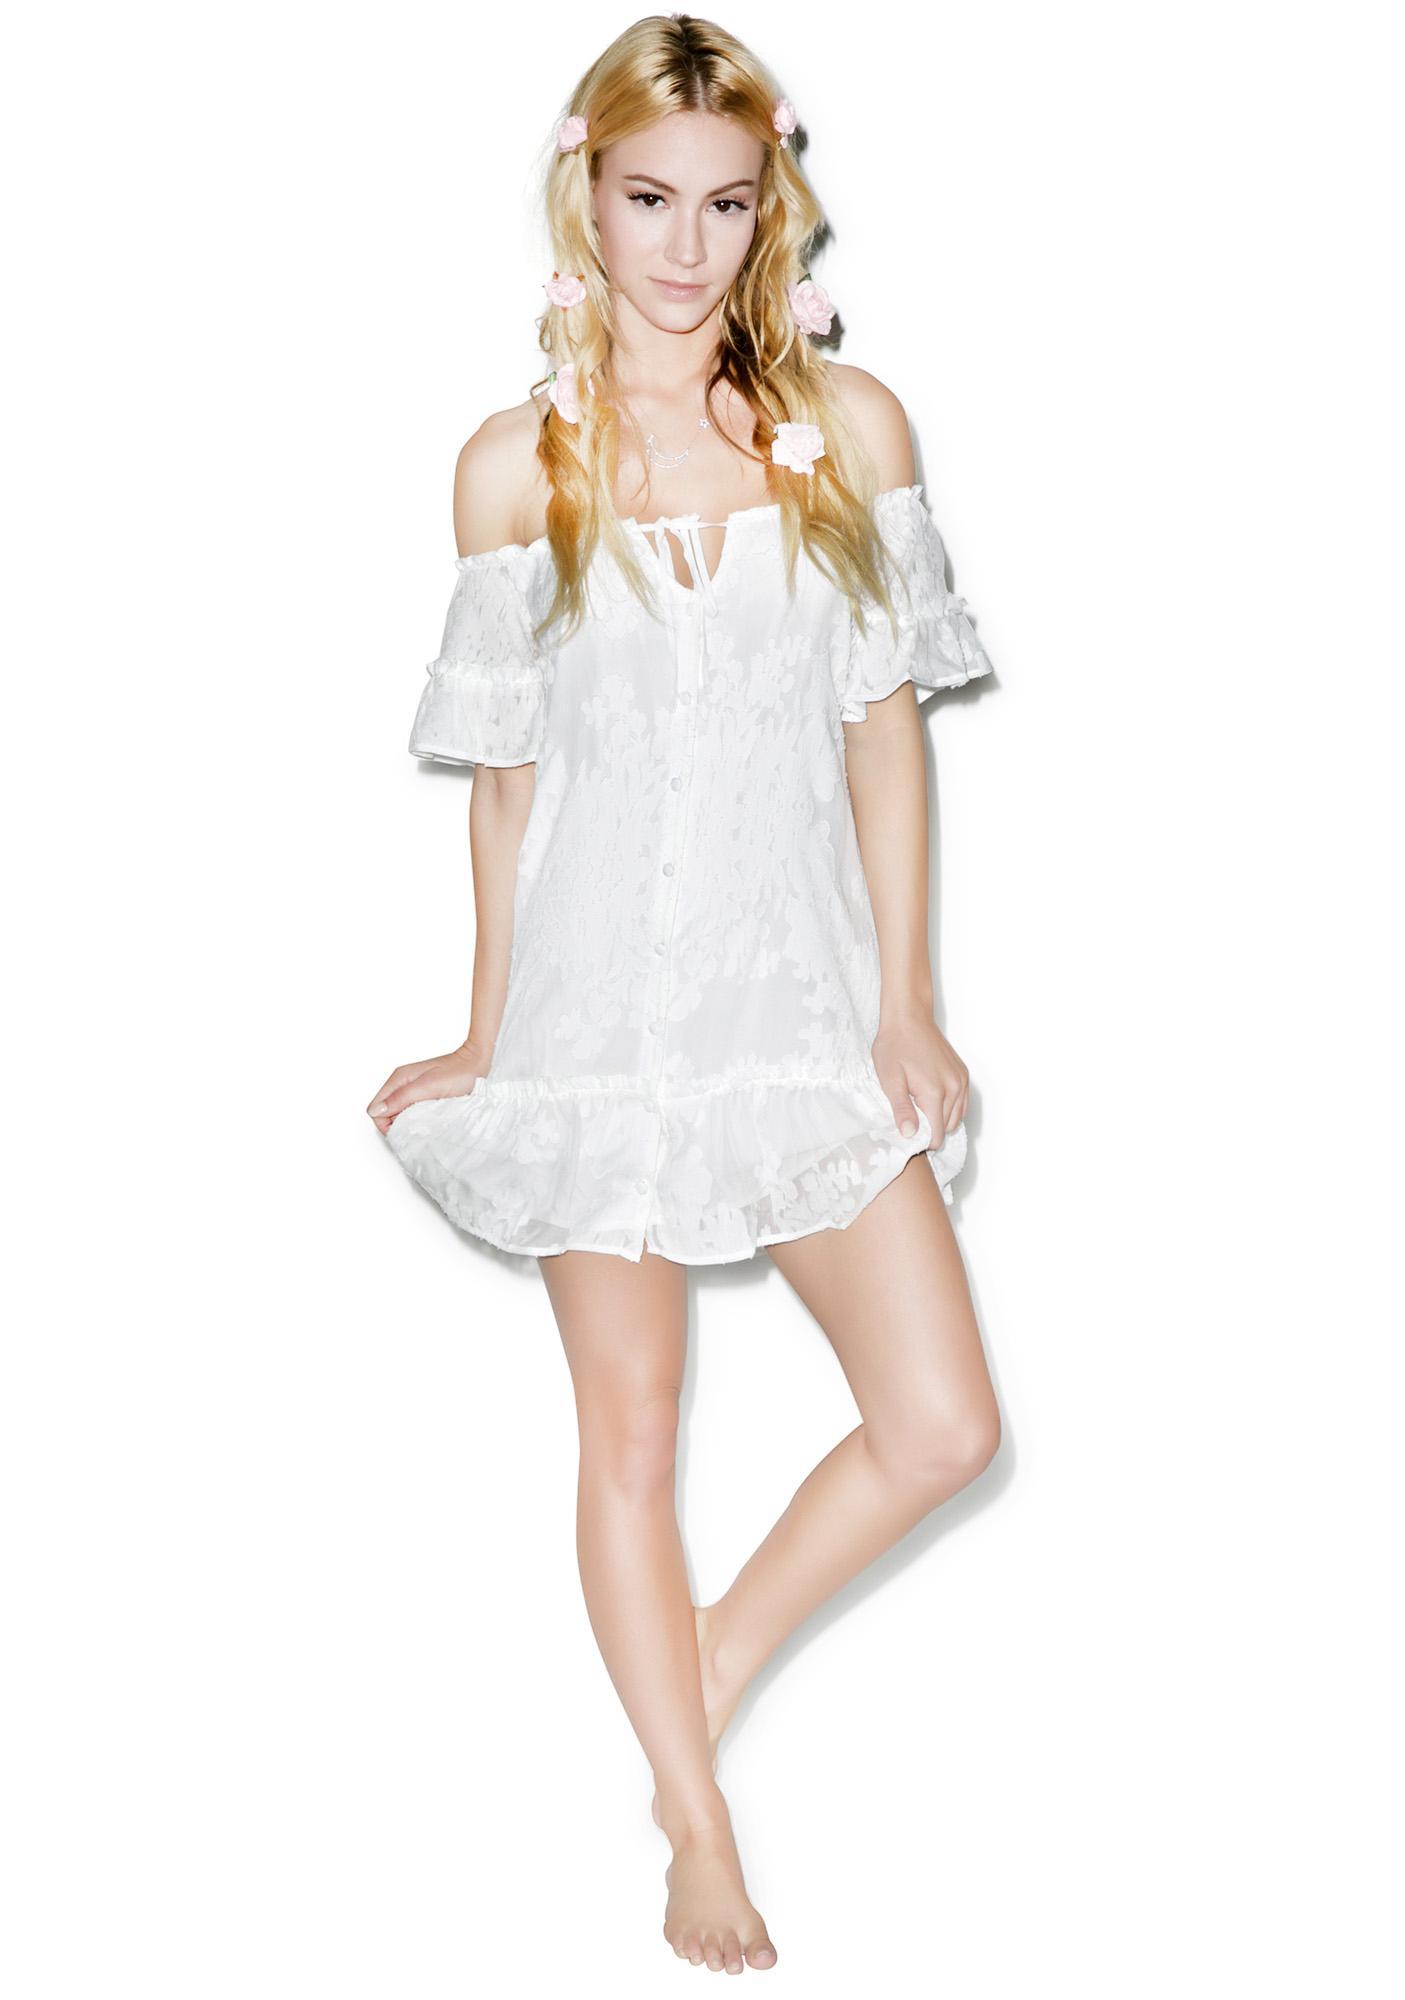 For Love & Lemons Pina Colada Mini Dress